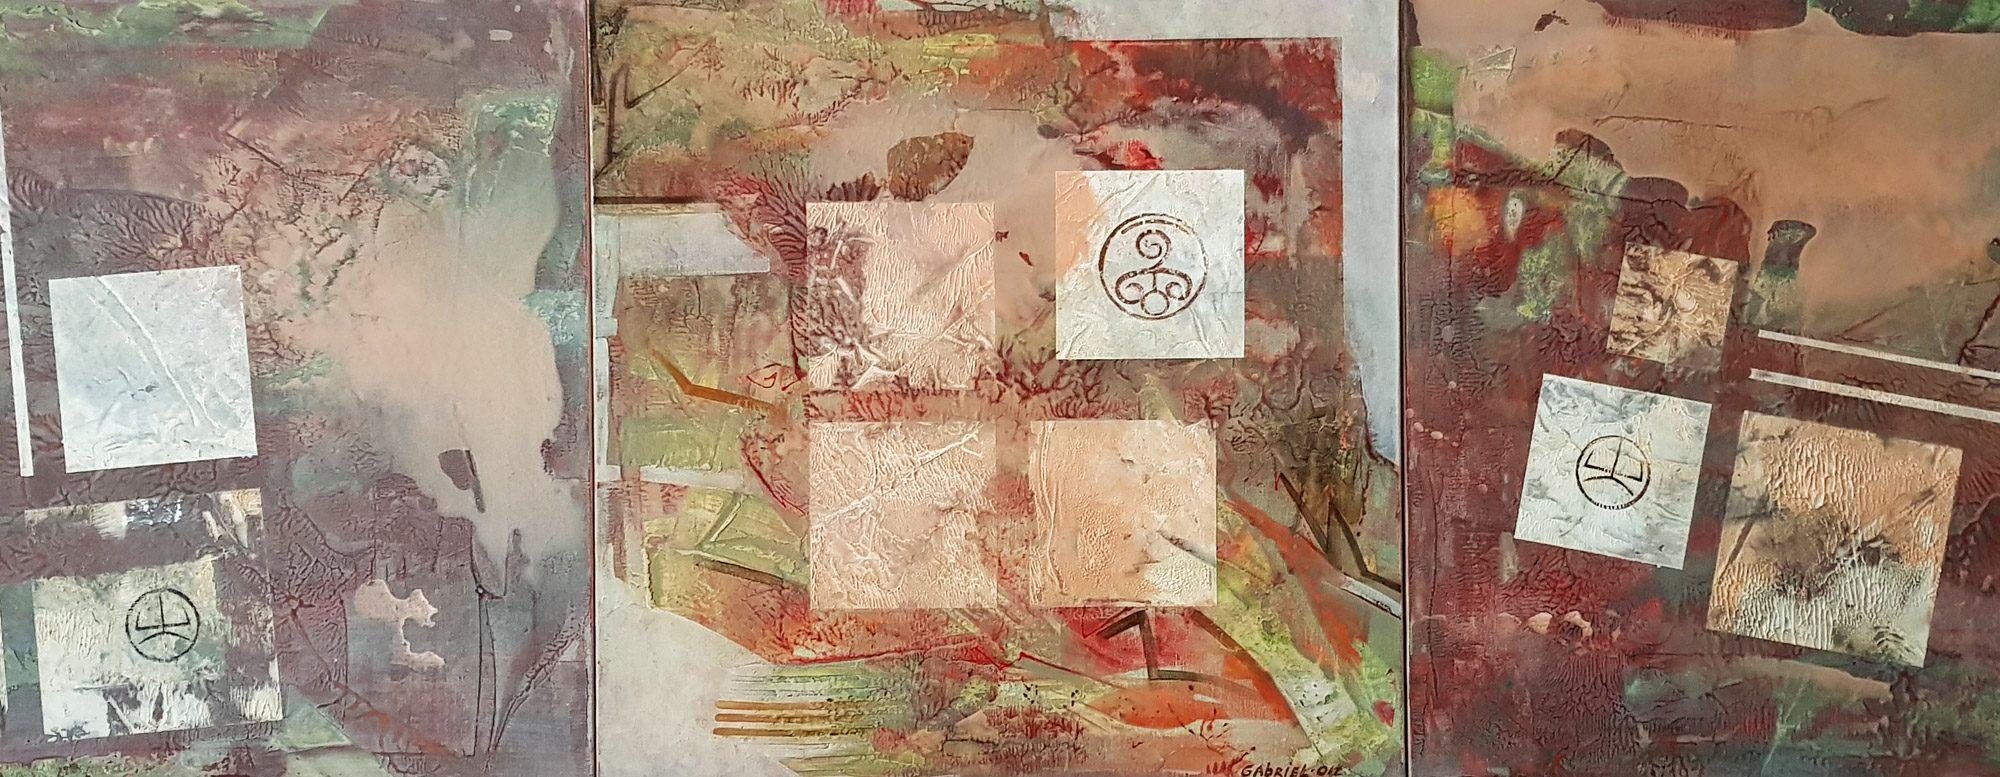 020 Duhovniat pat kam bojestvenata lubov acryloil on canvas 60x180cm